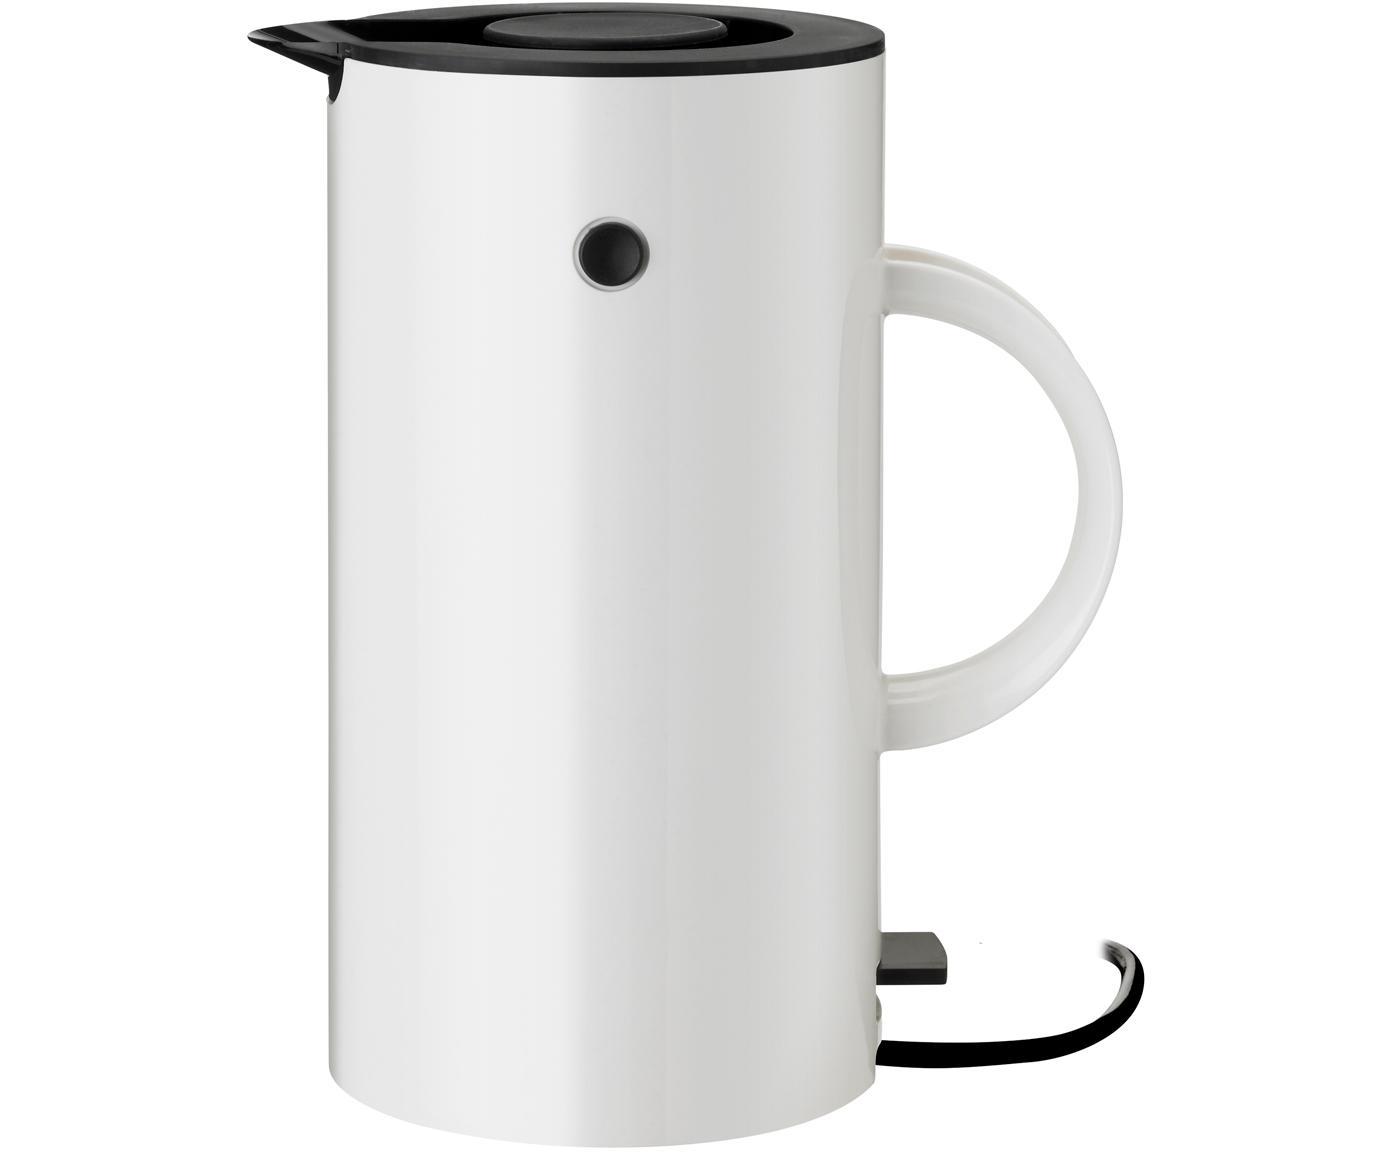 Wasserkocher EM77 in Weiss glänzend, Gehäuse: Metall, beschichtet, Weiss, Schwarz, 1,5 L